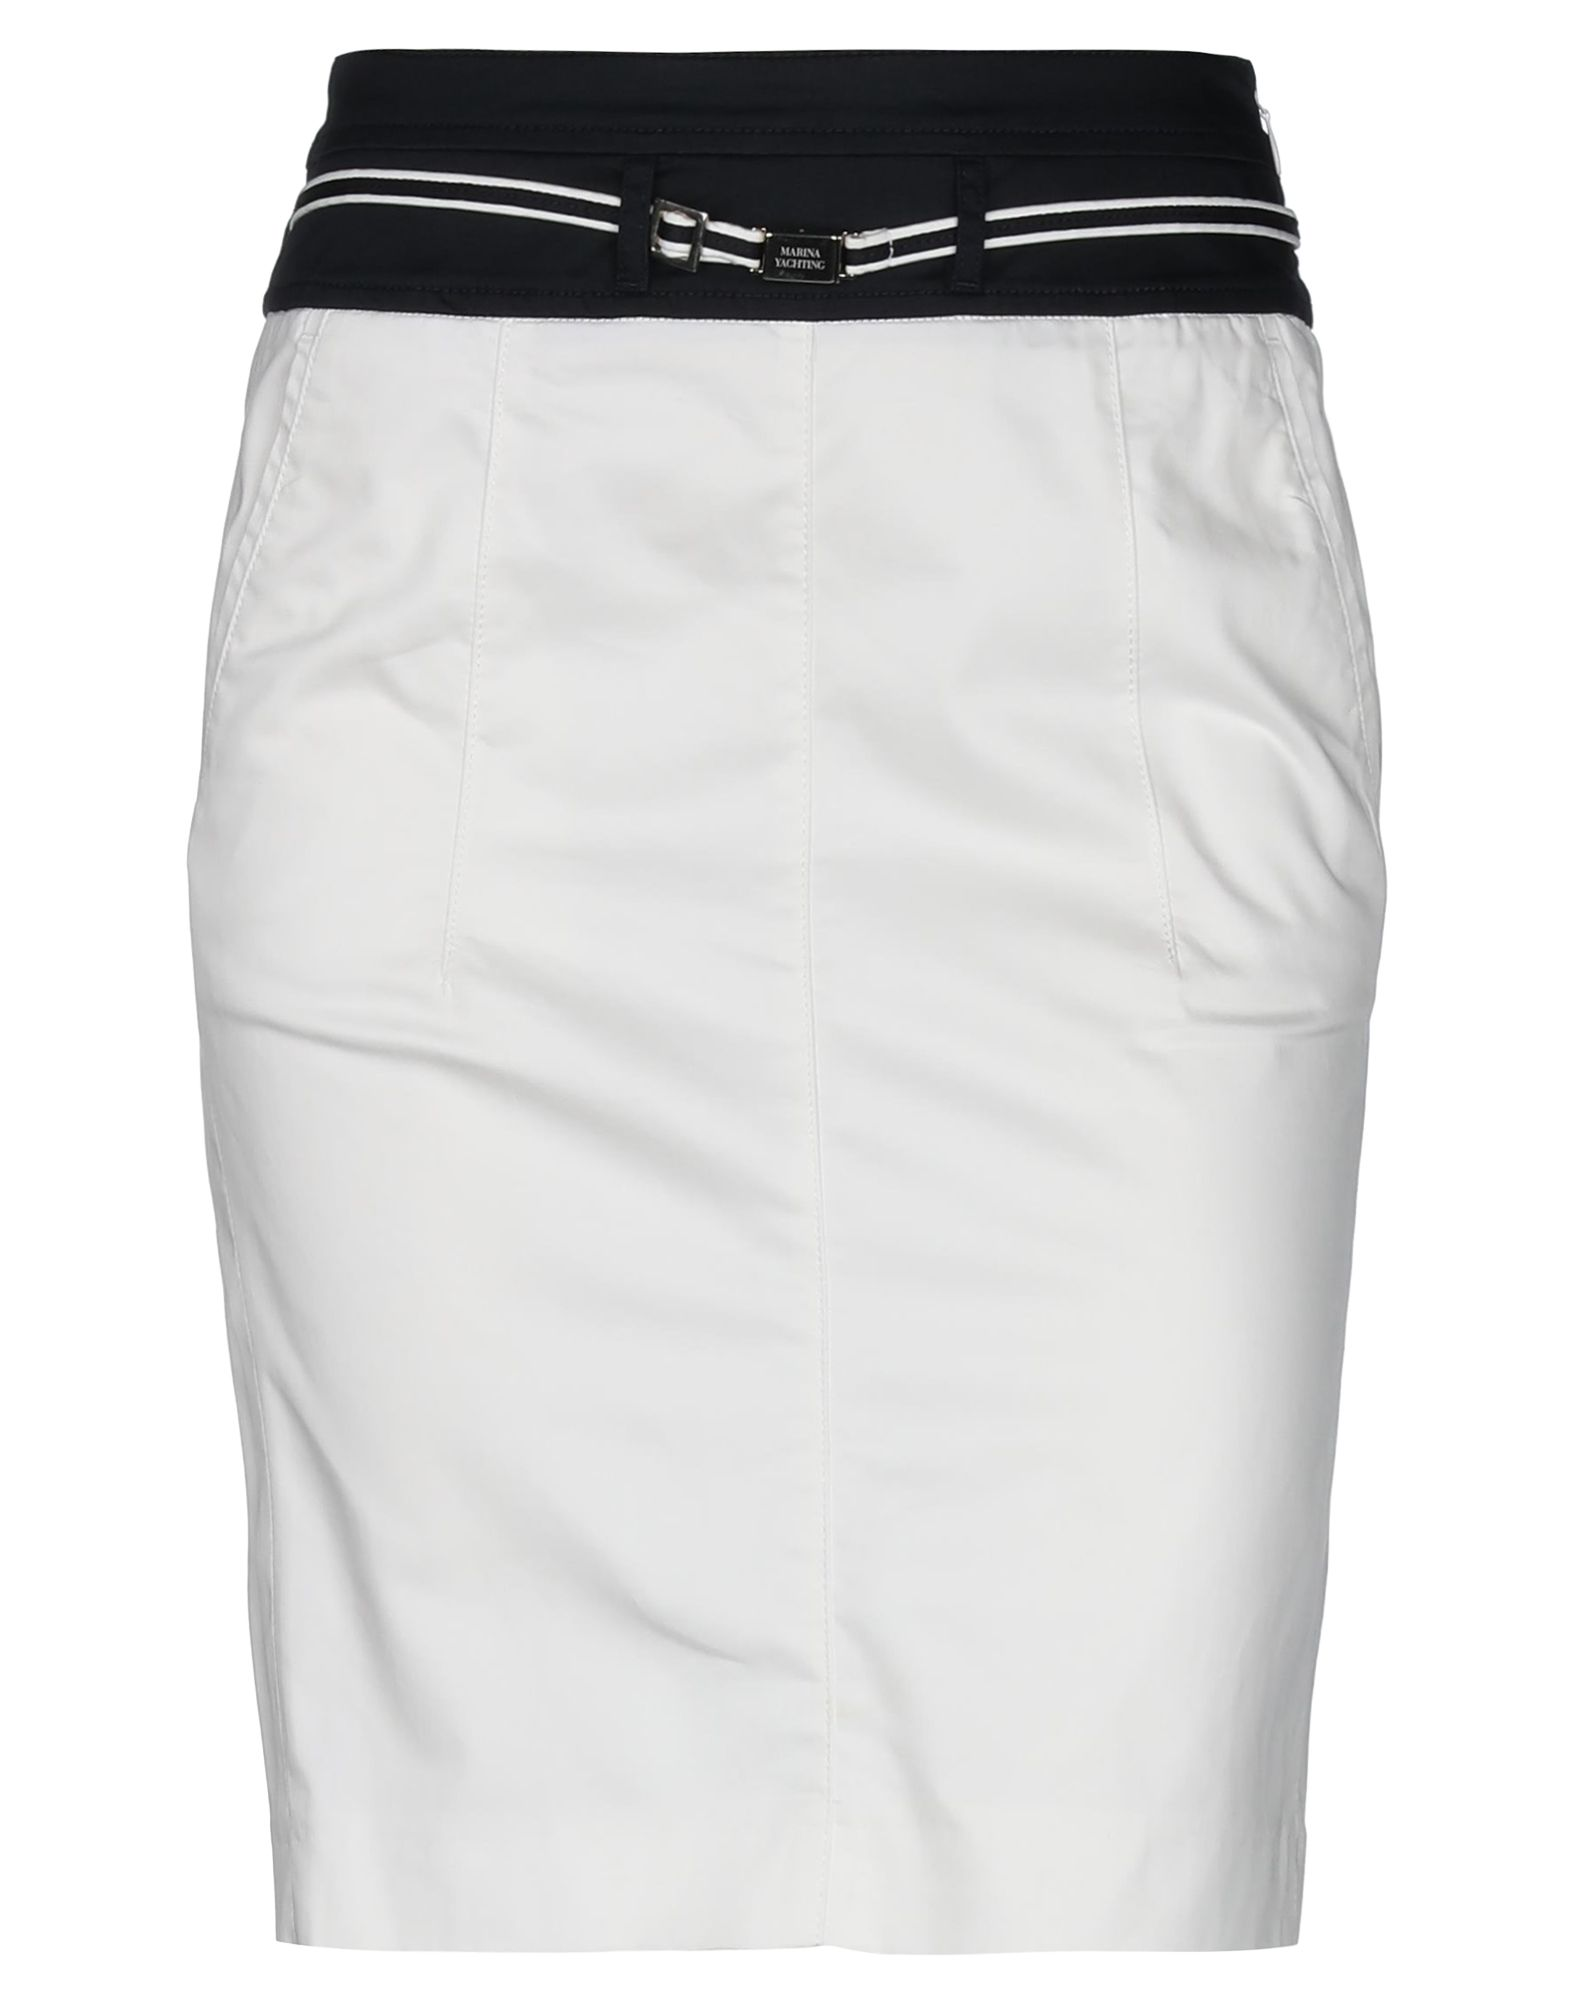 Фото - MARINA YACHTING Юбка до колена marina yachting юбка длиной 3 4